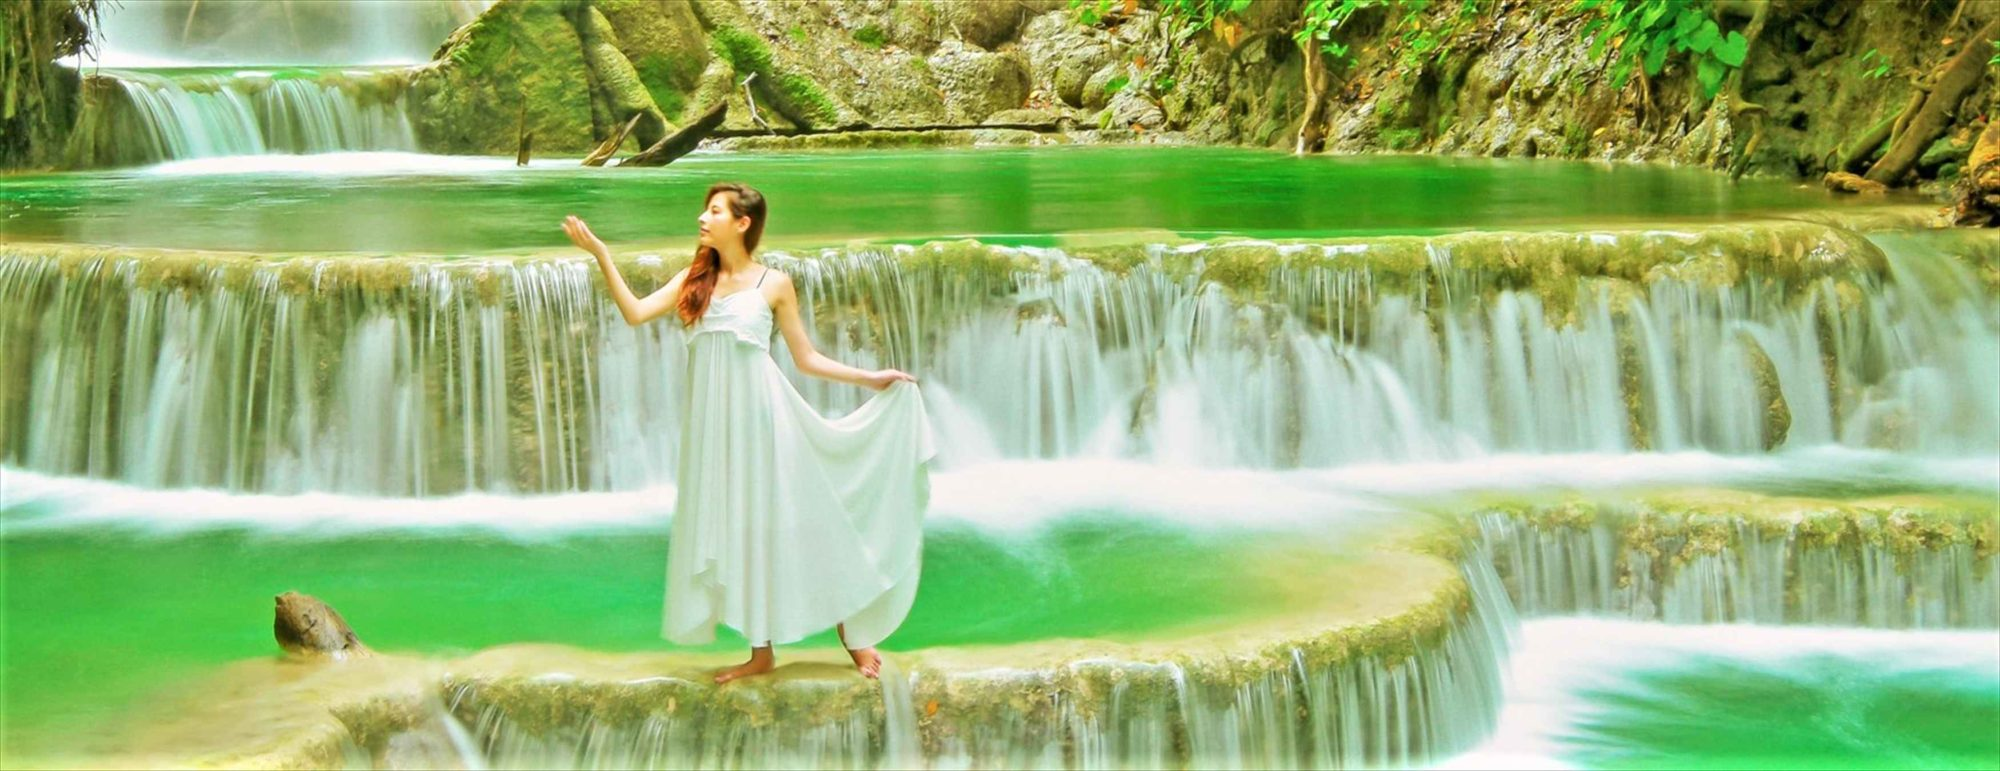 Amanwana Moyo Island Waterfall<br /> アマンワナ・モヨ島・ウォーターフォール